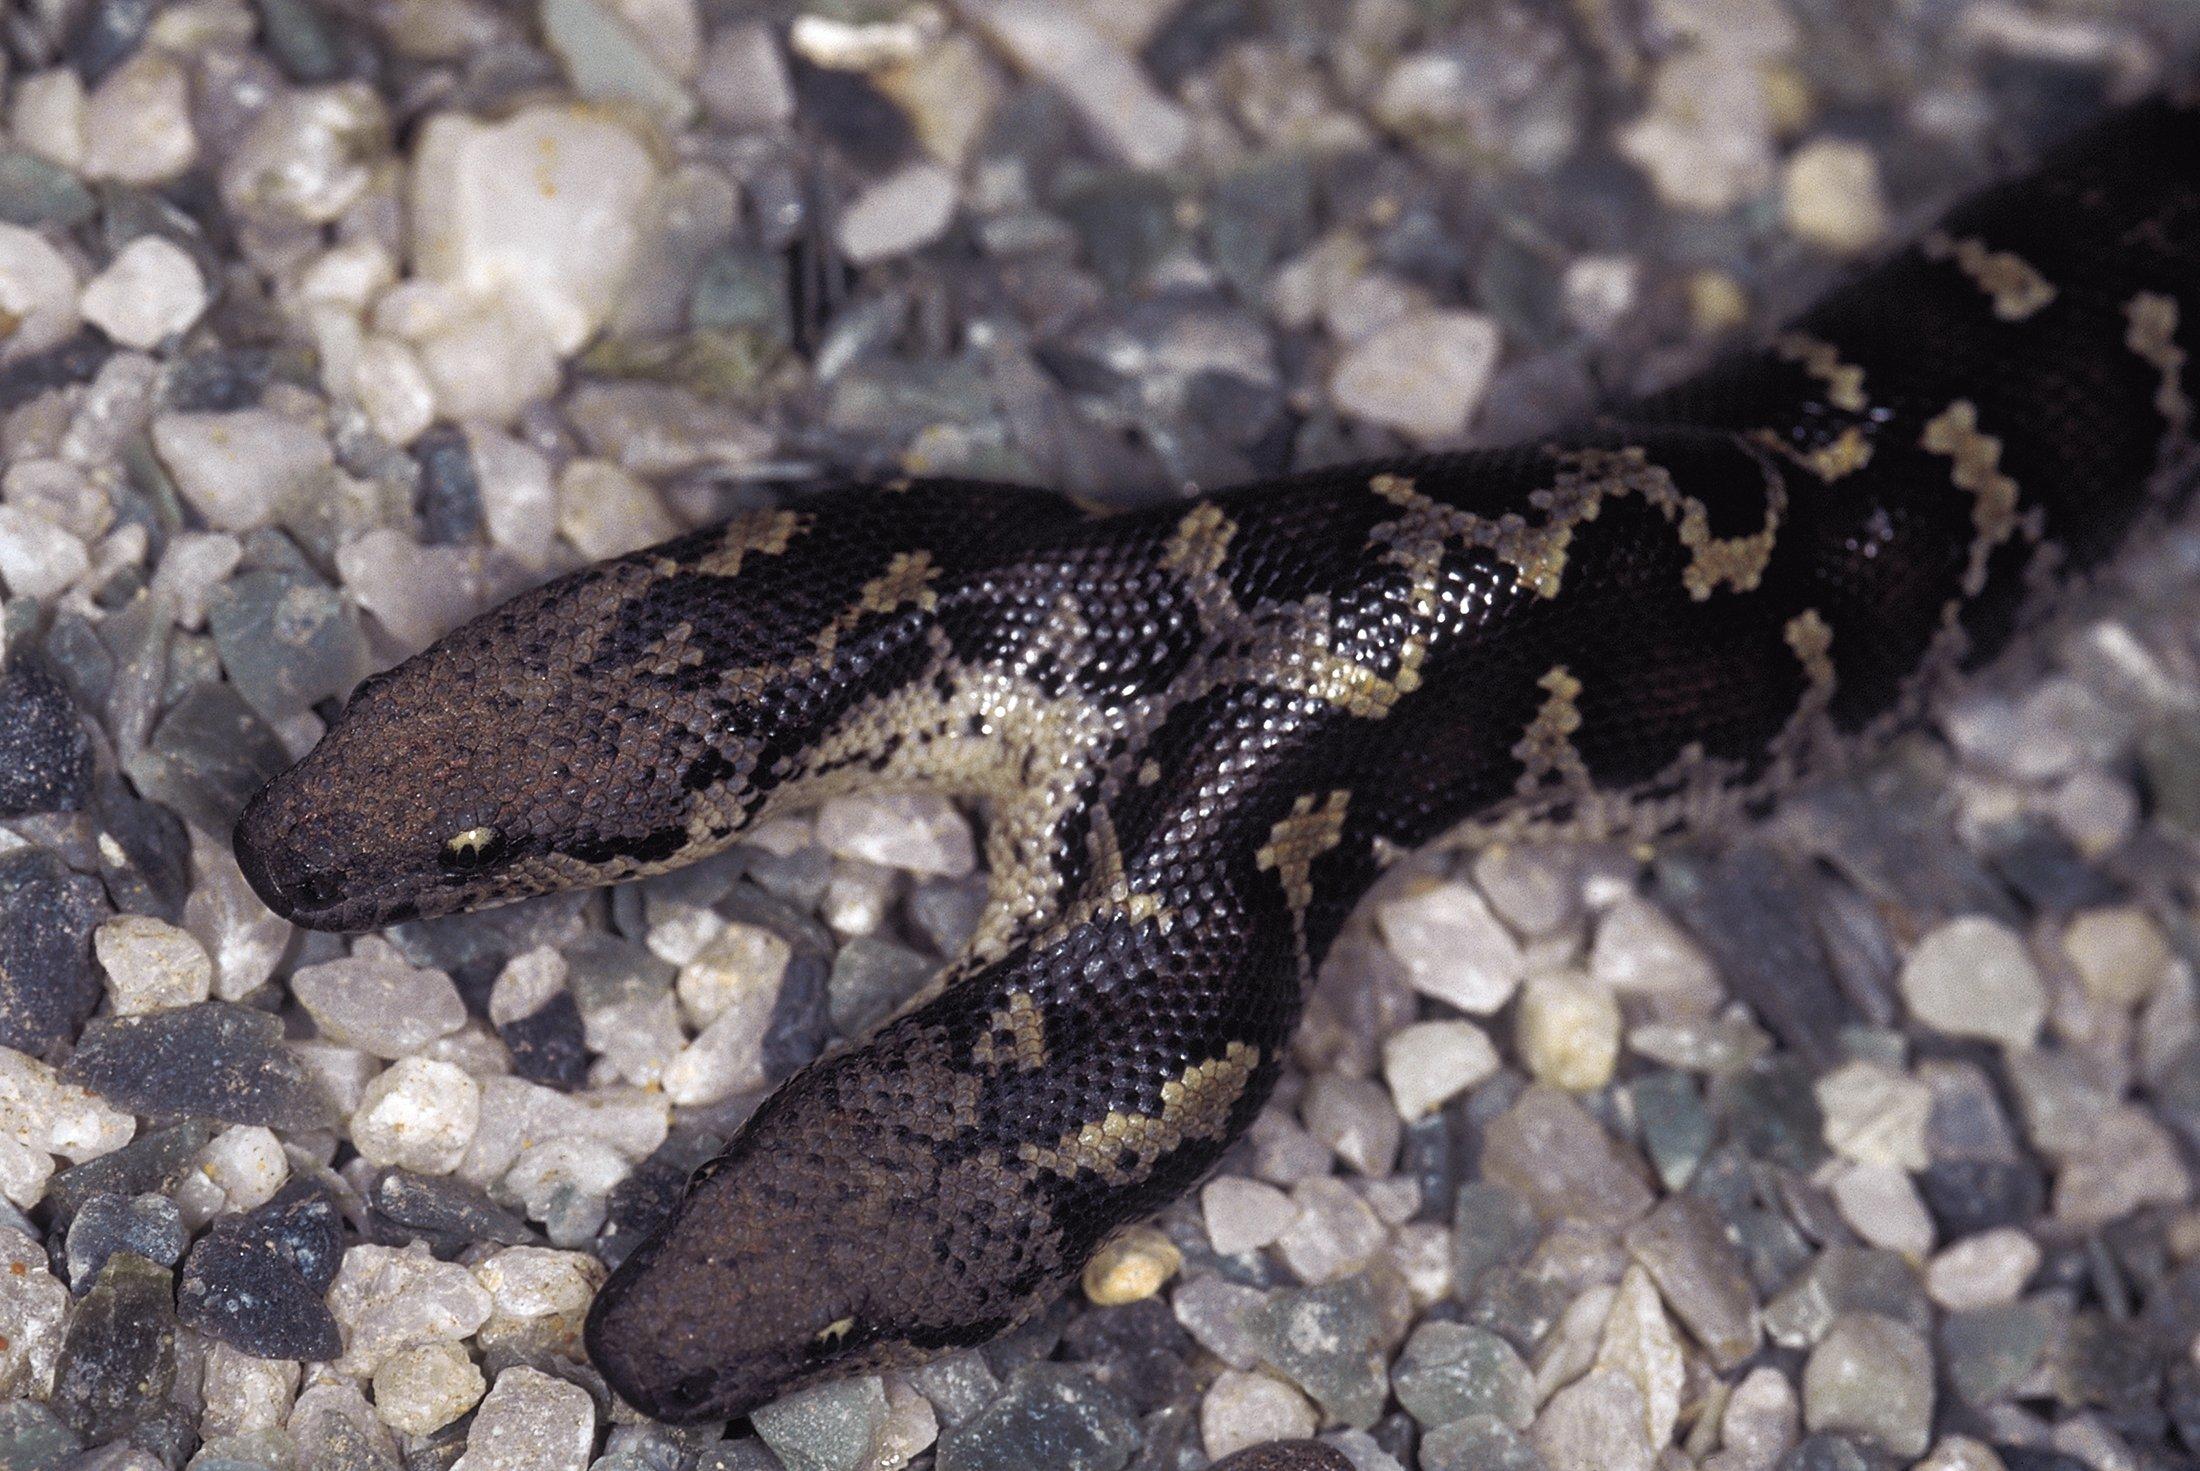 Rare double-headed snake born in Germany